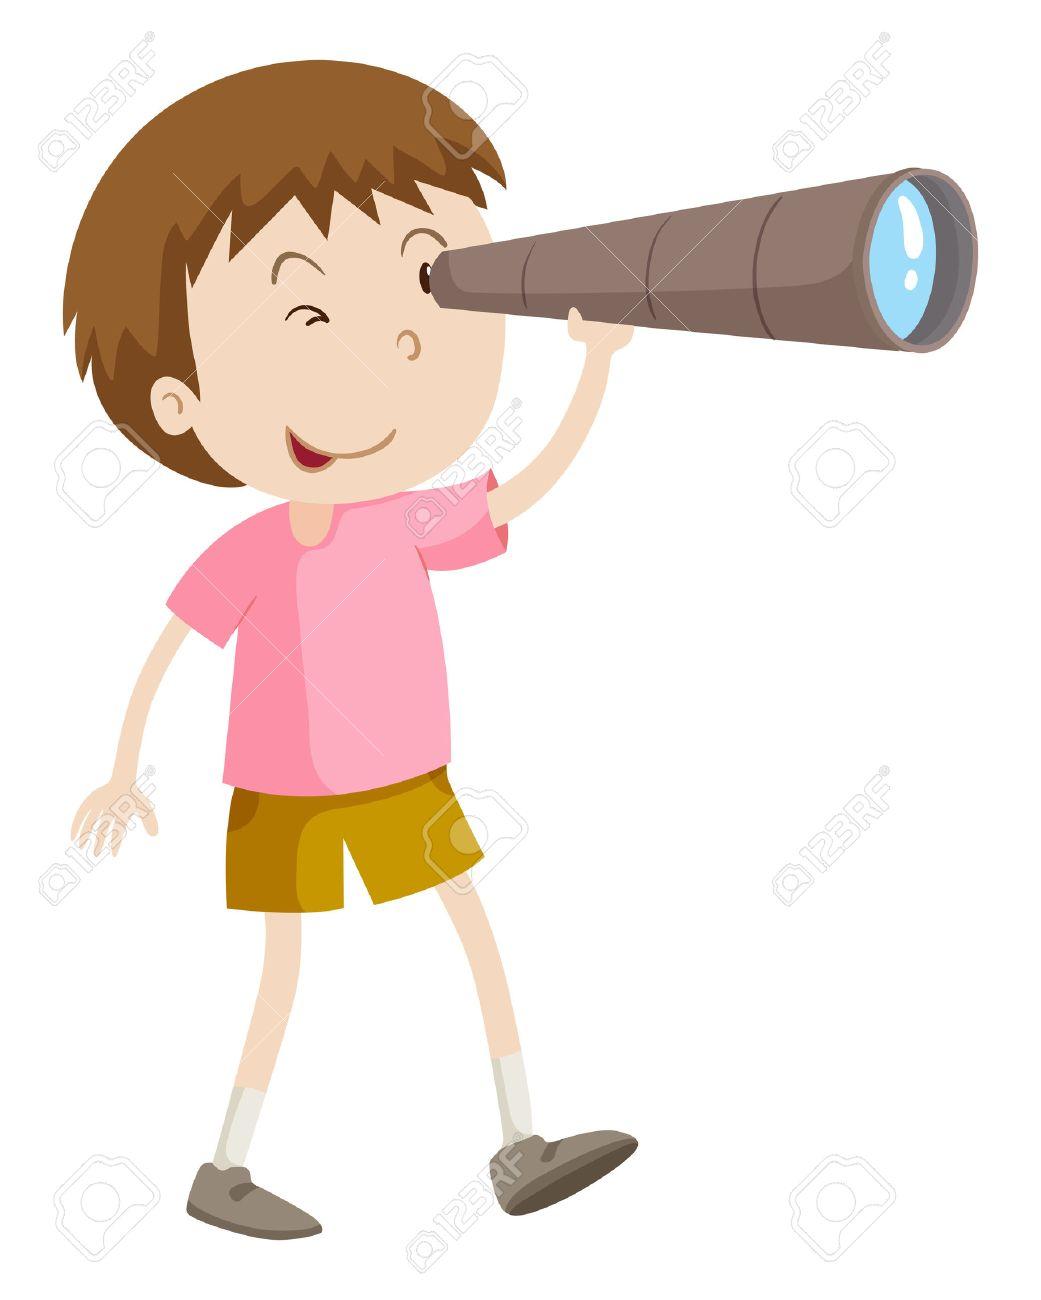 Boy looking through telescope illustration.